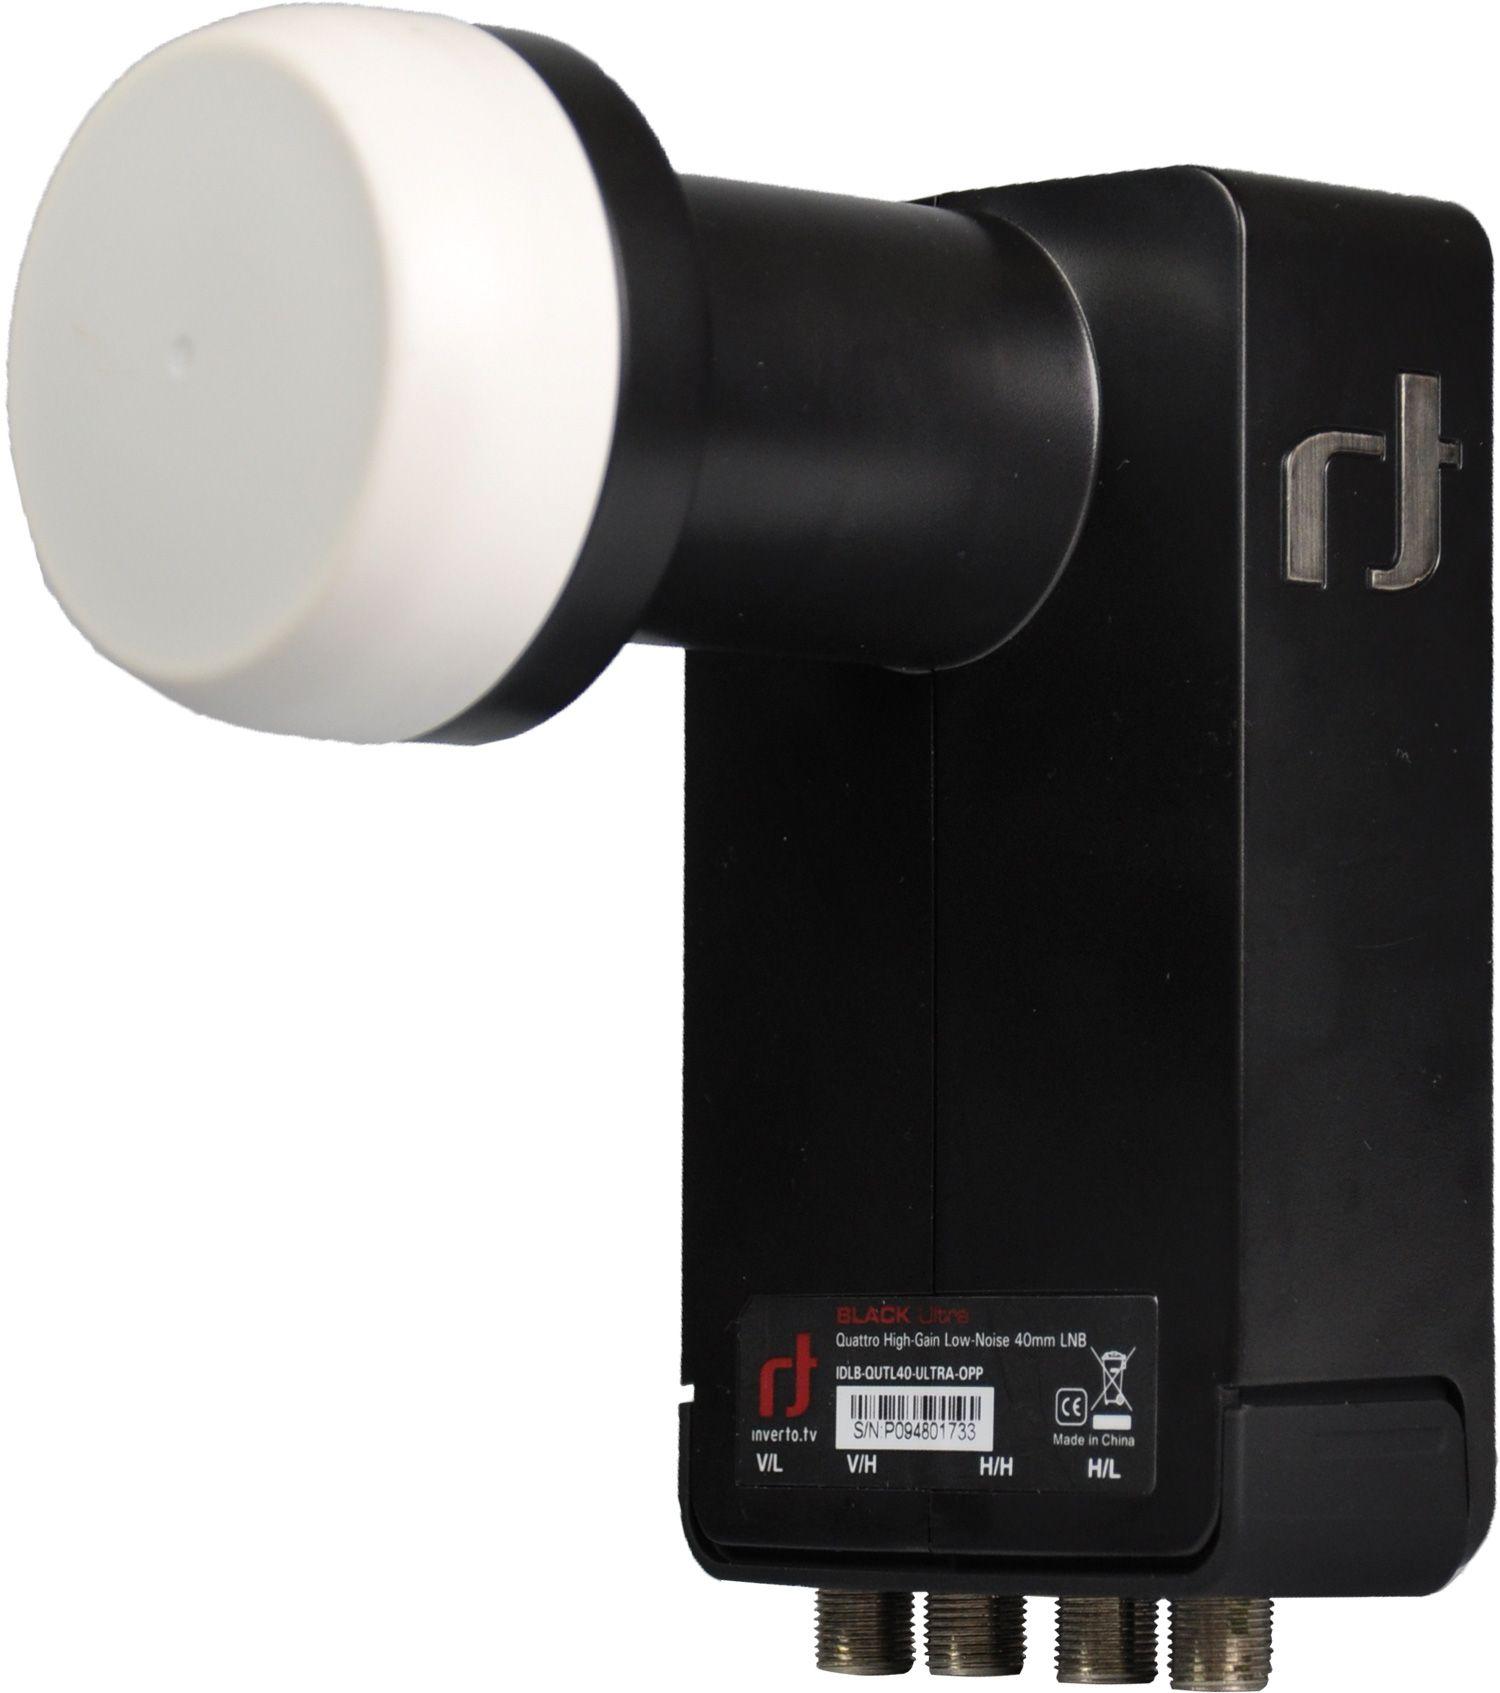 Inverto Black Ultra Quattro - LNB